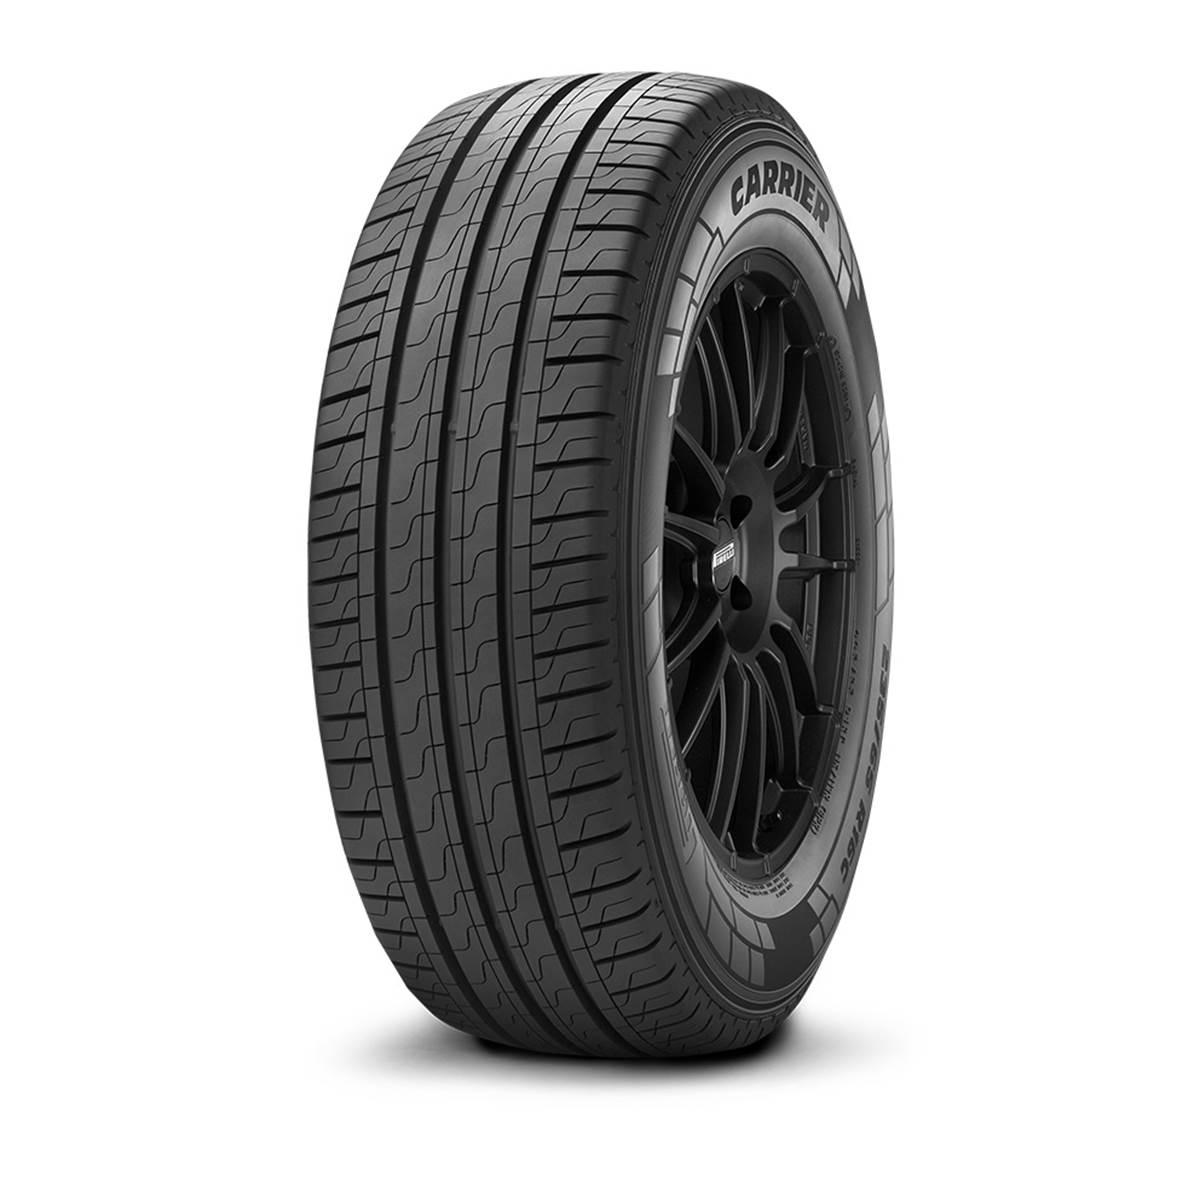 Pneu Camionnette Pirelli 235/65R16 115R Carrier